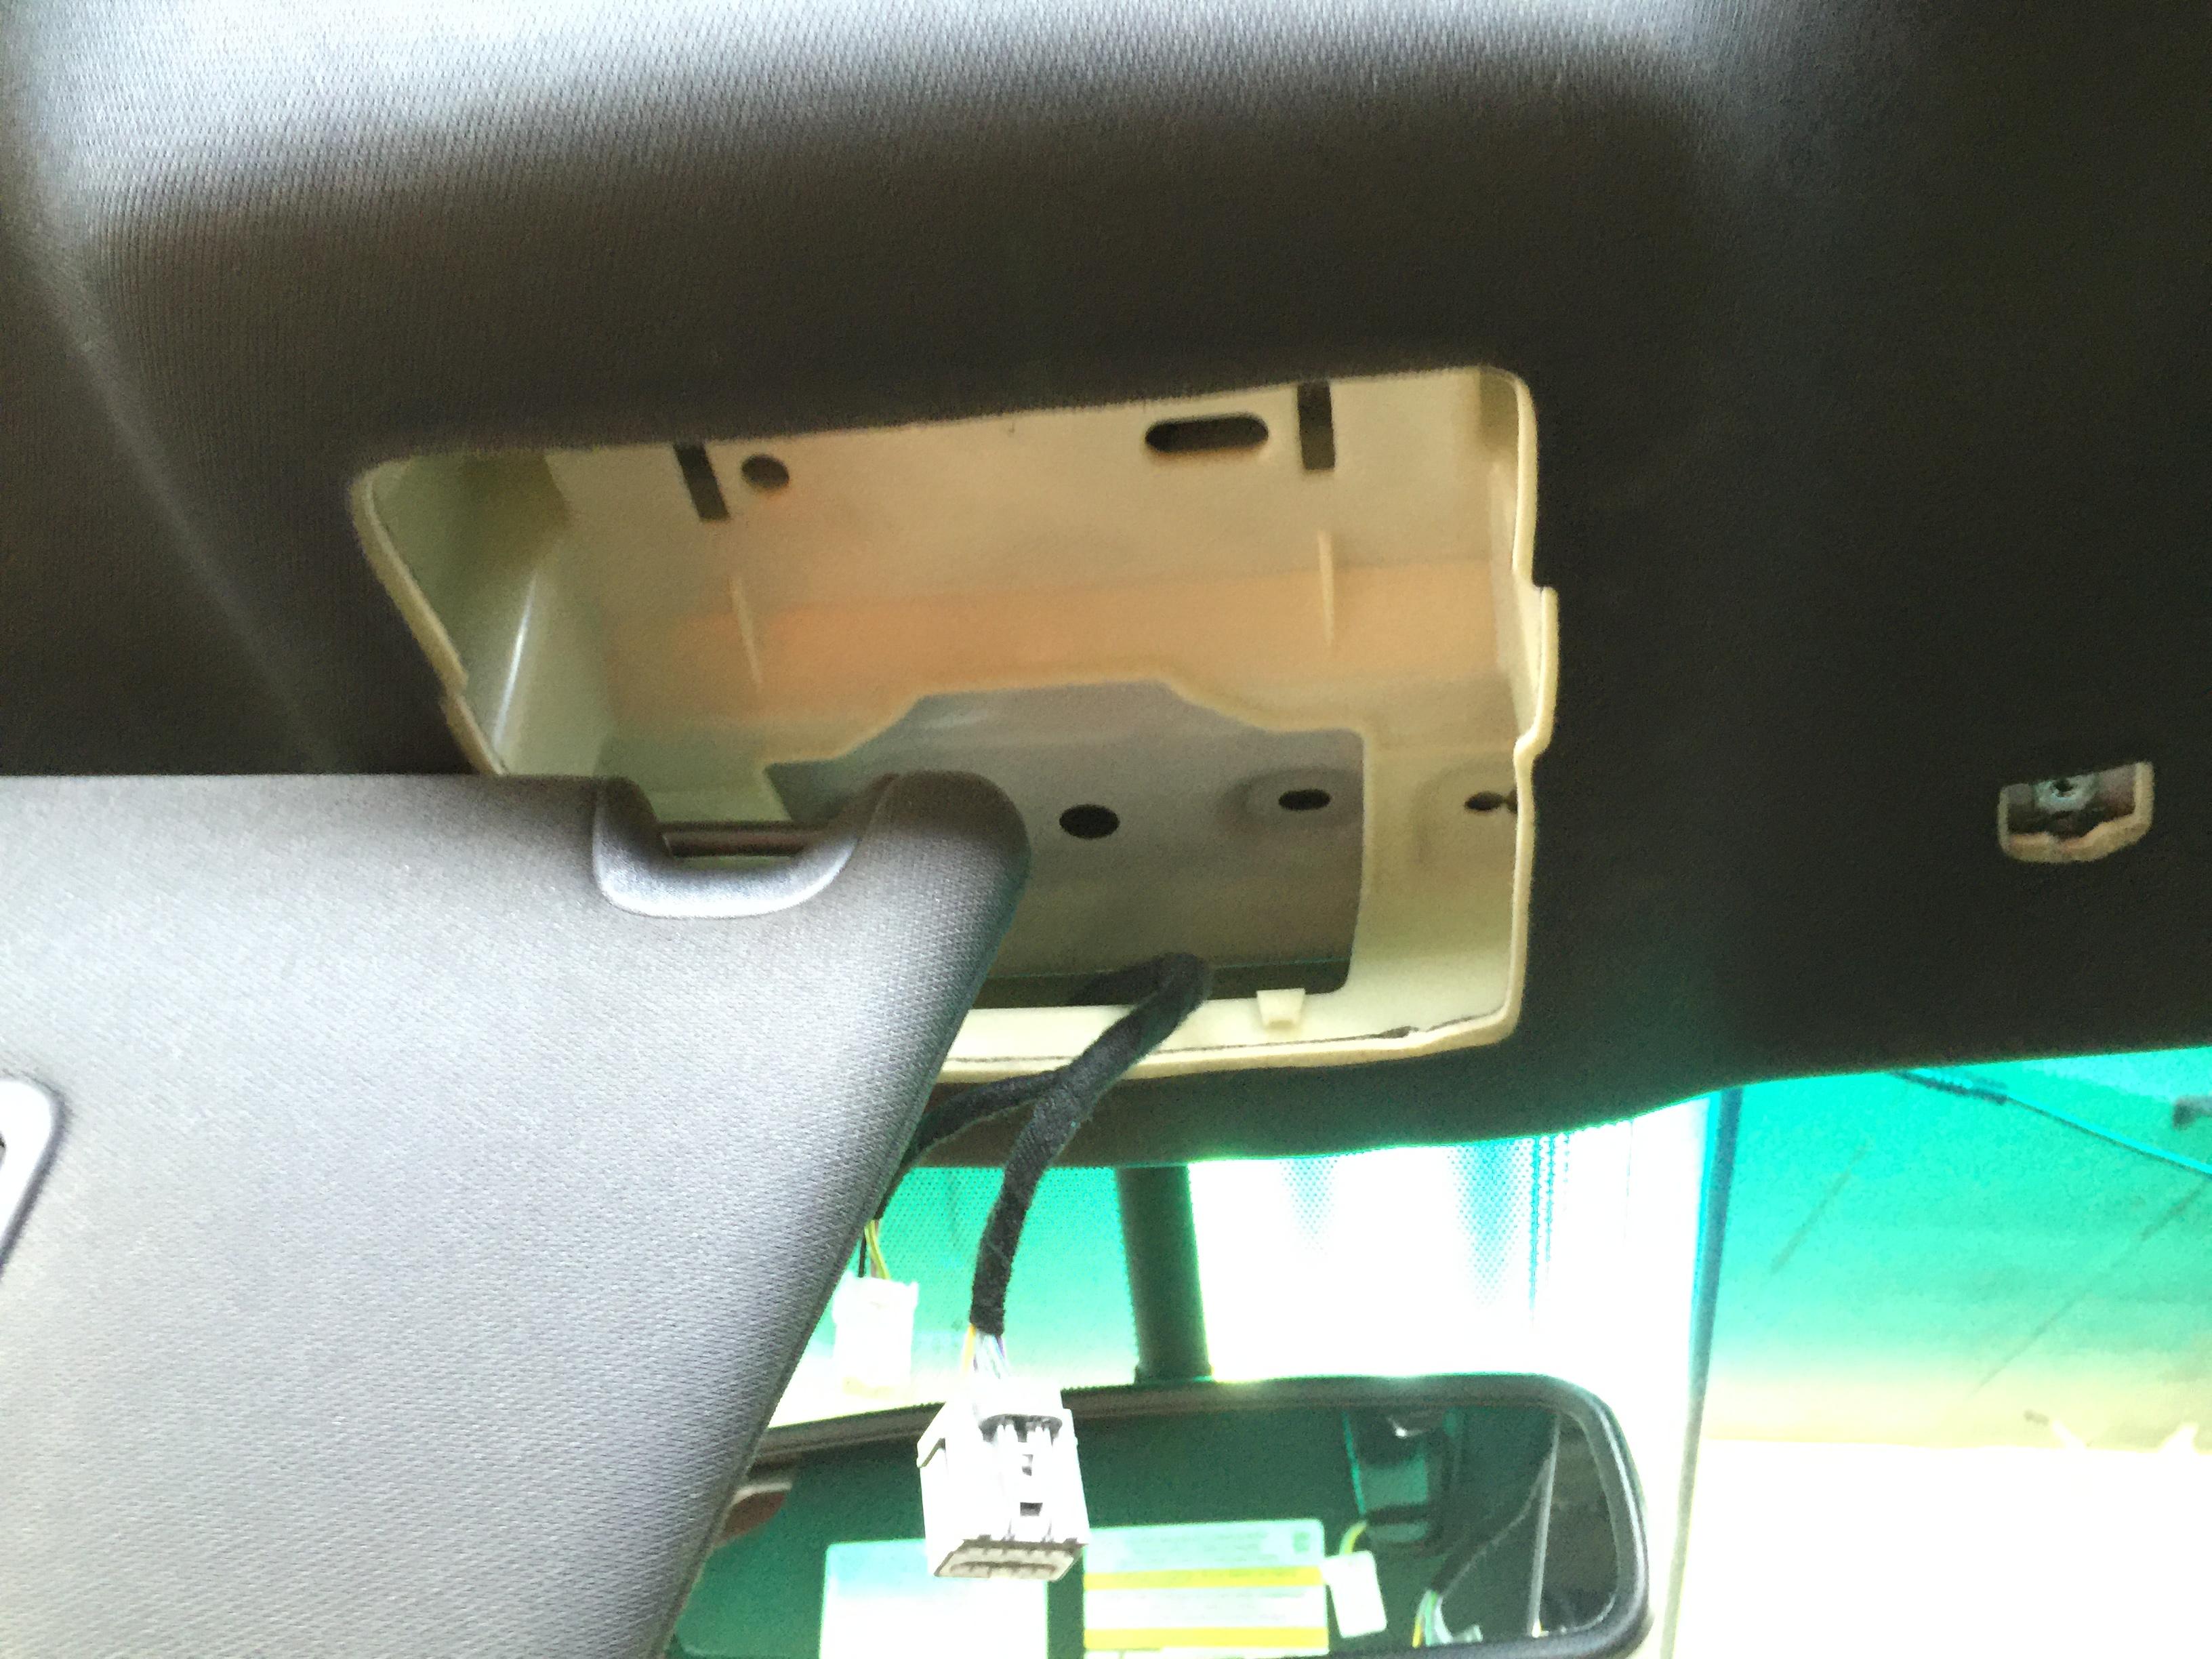 2014 Ford Explorer XLT Tri Coat White, Paintless Dent Repair Roof Dents, Mobile Dent Repair. , Springfield IL, Pana IL Taylorville IL